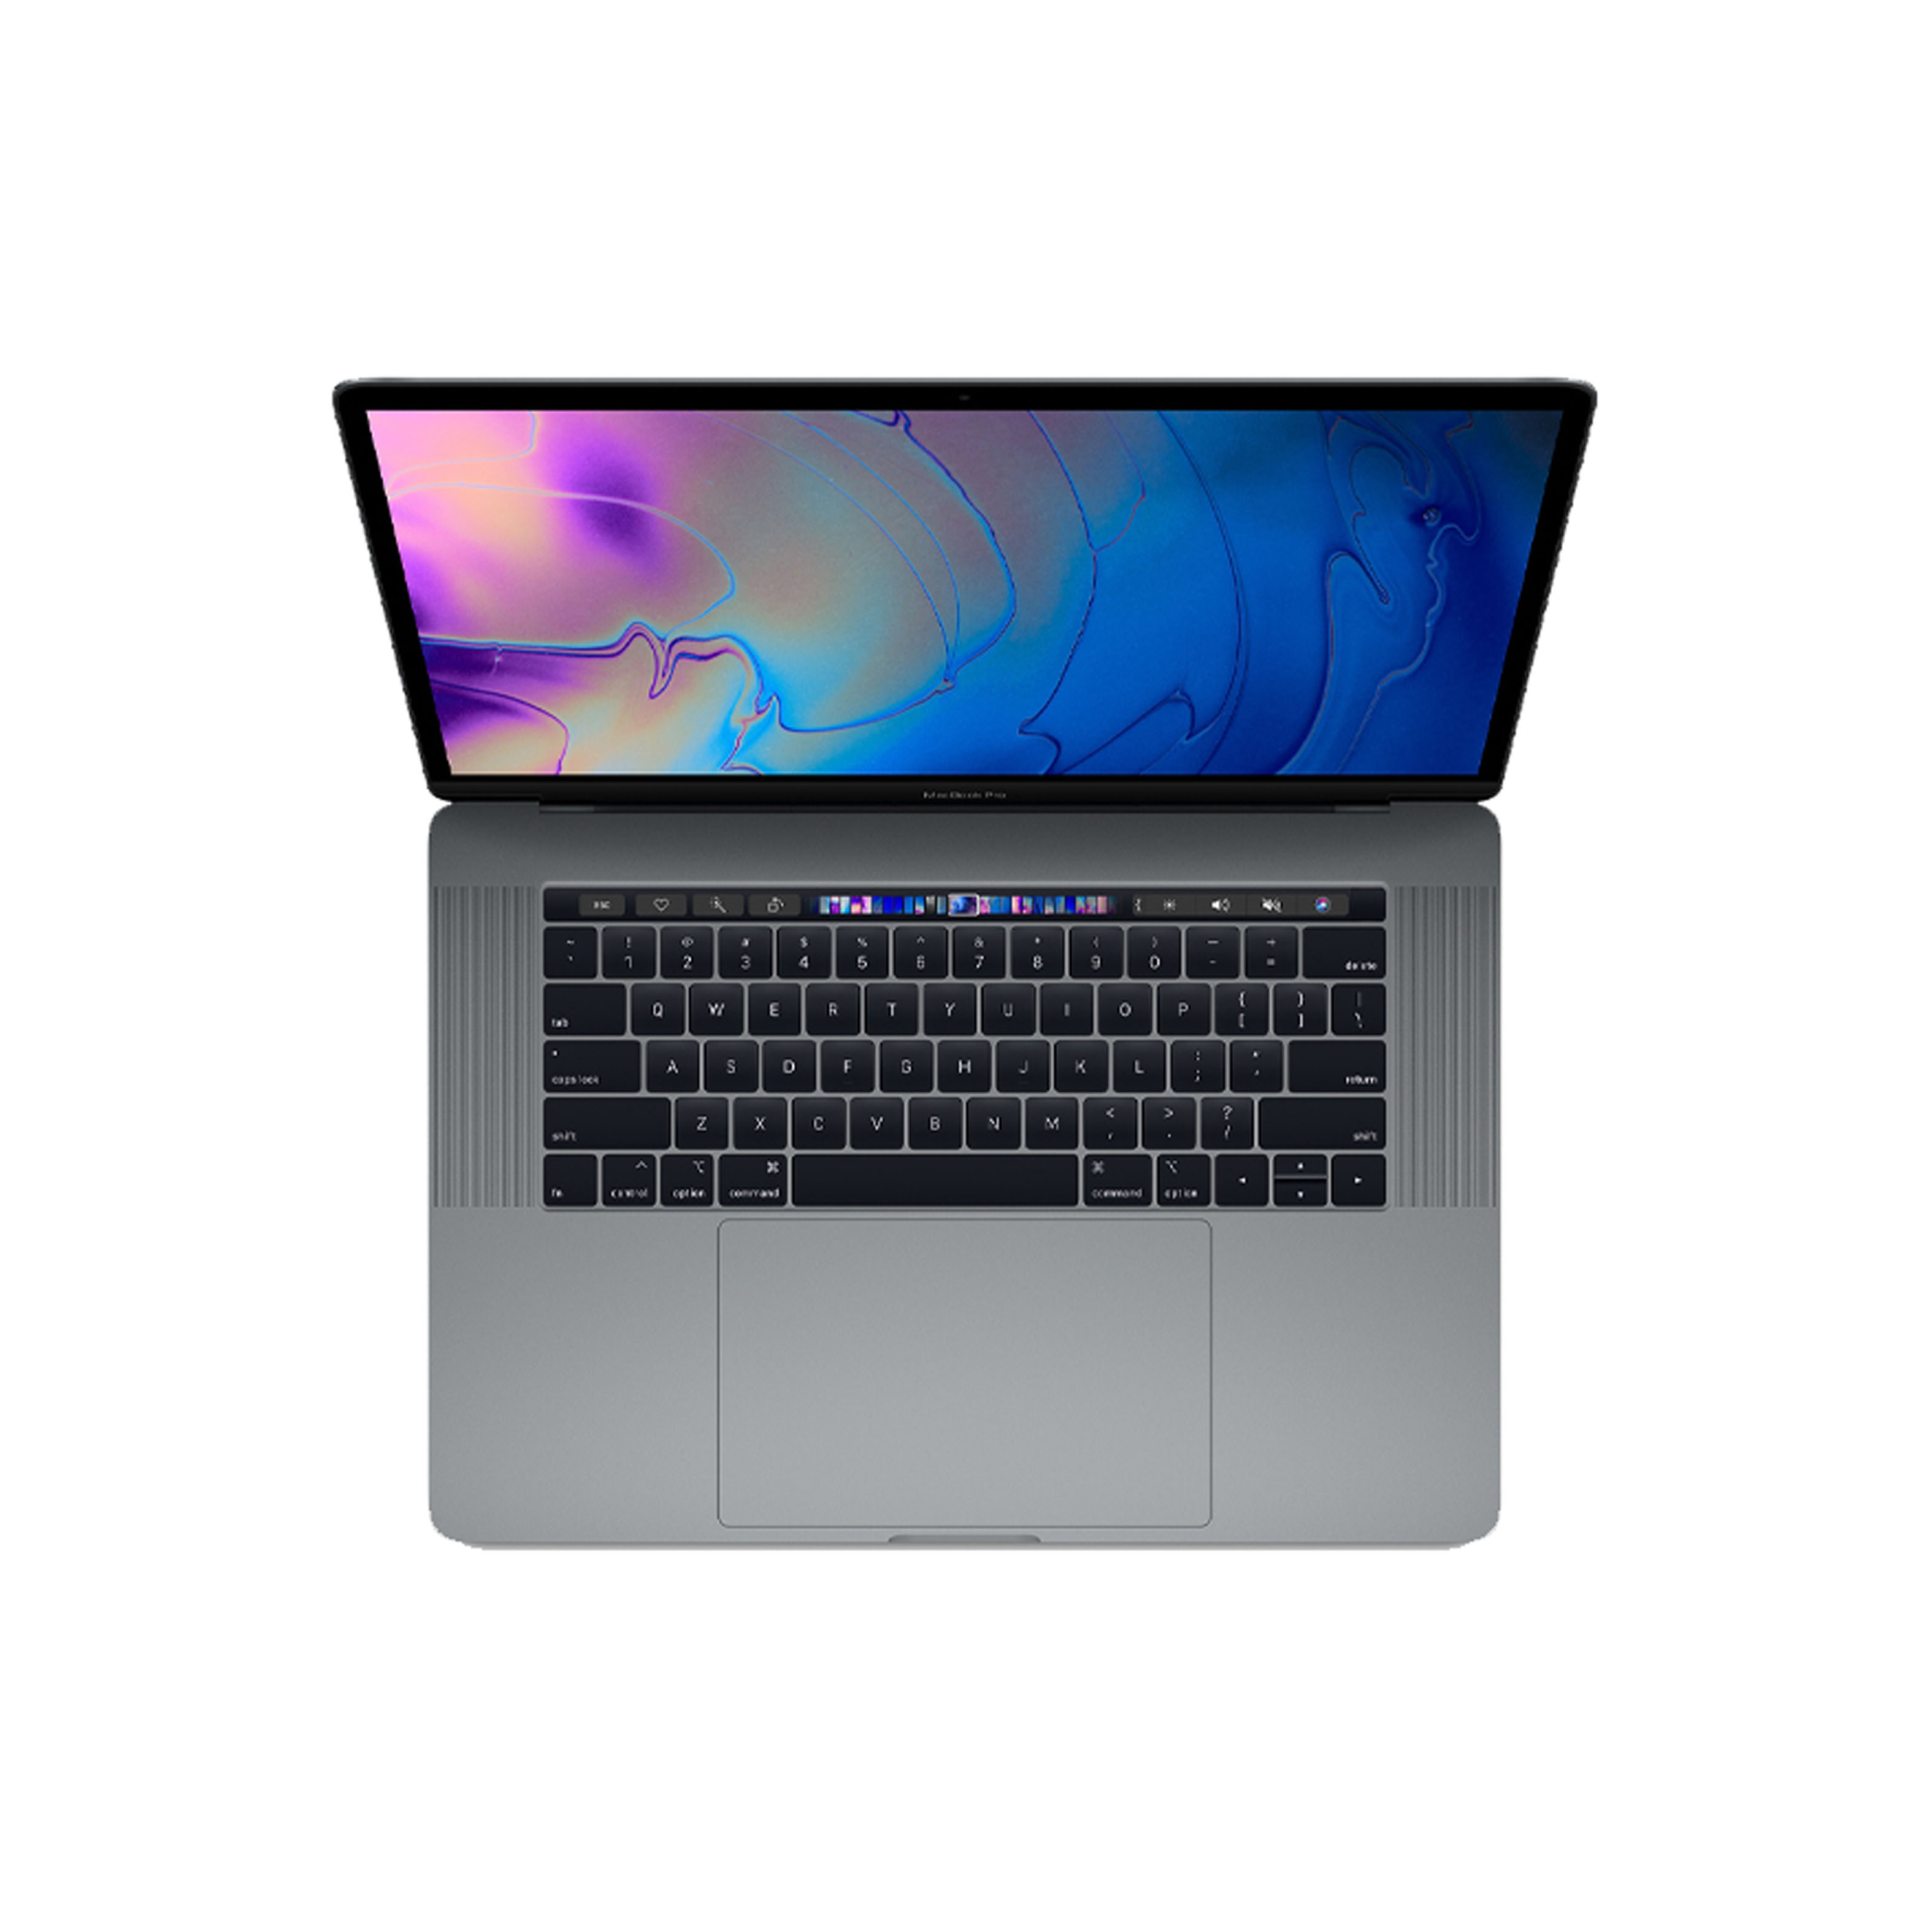 Apple 15in MacBook Pro 2018 - 2.2GHz Intel i7 256GB - Space Grey (MR932X/A)